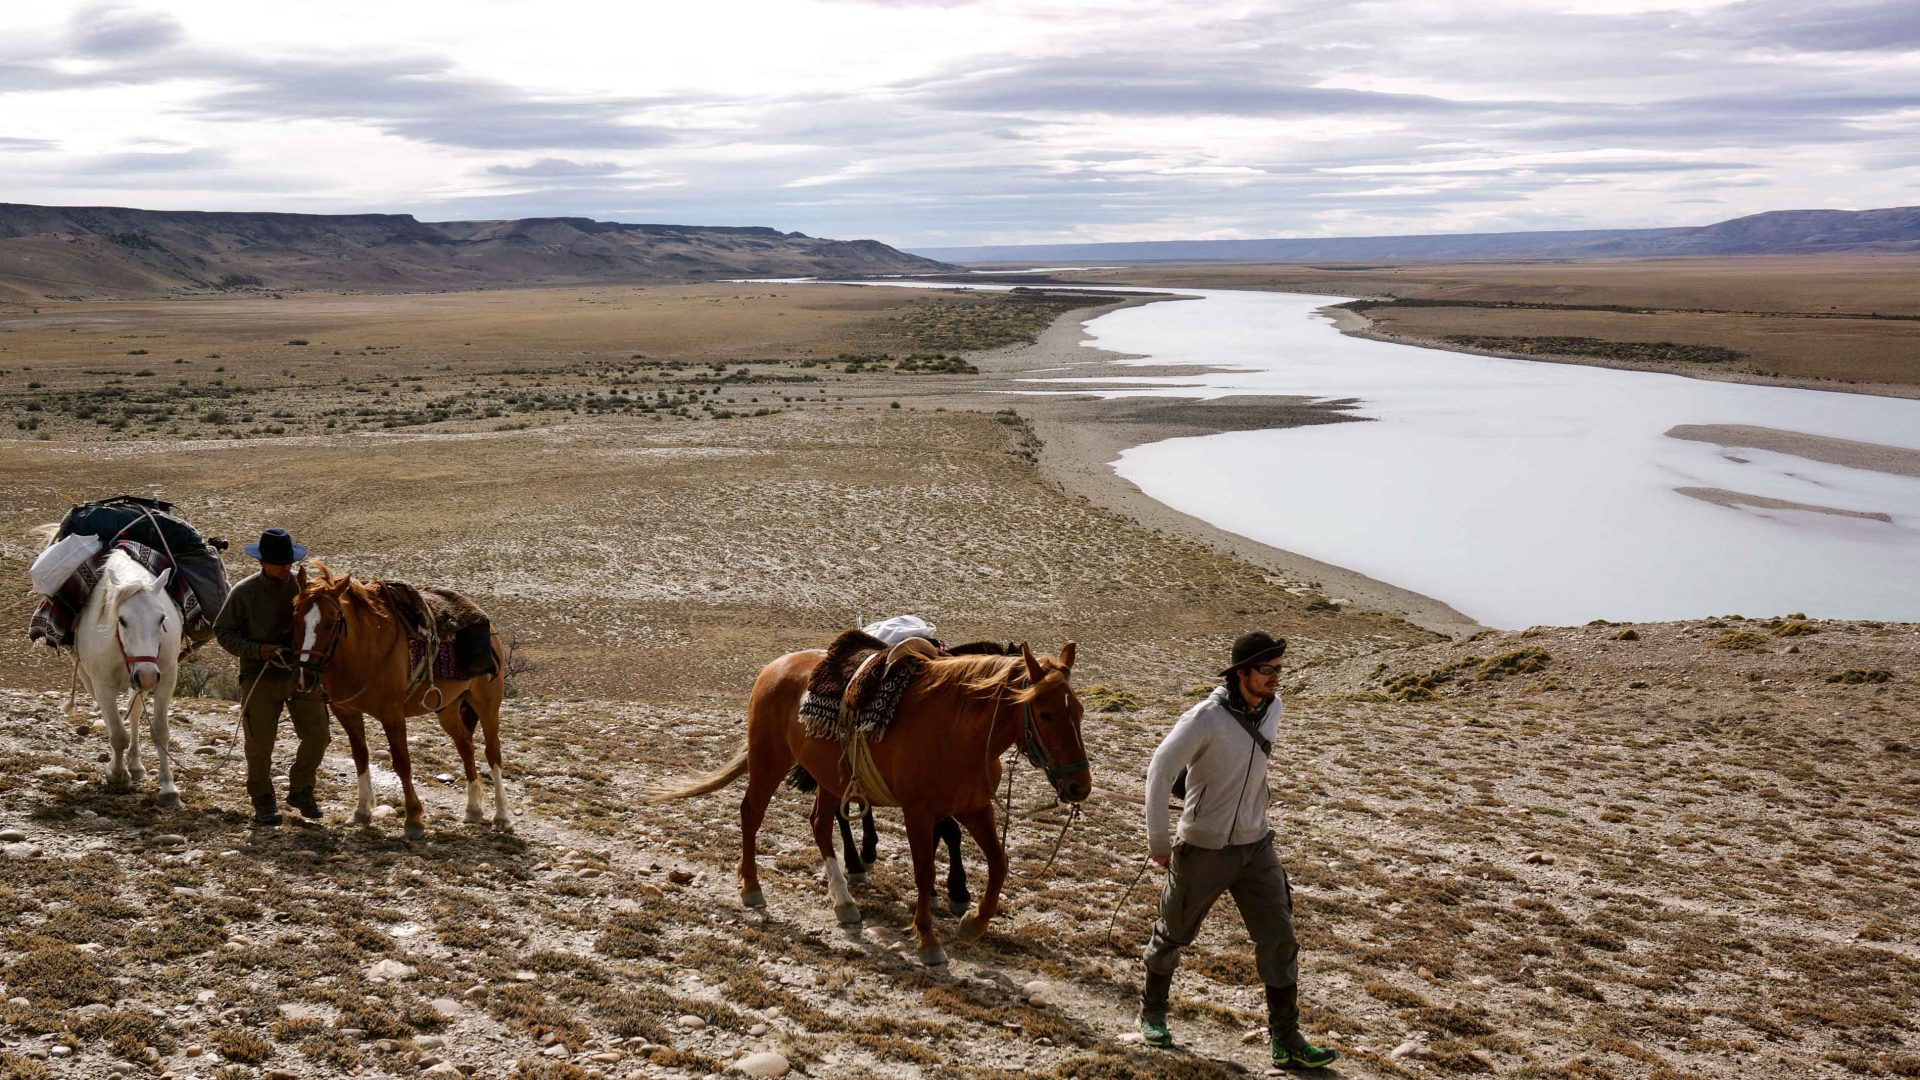 Following the Santa Cruz river in Patagonia with no phone signal.